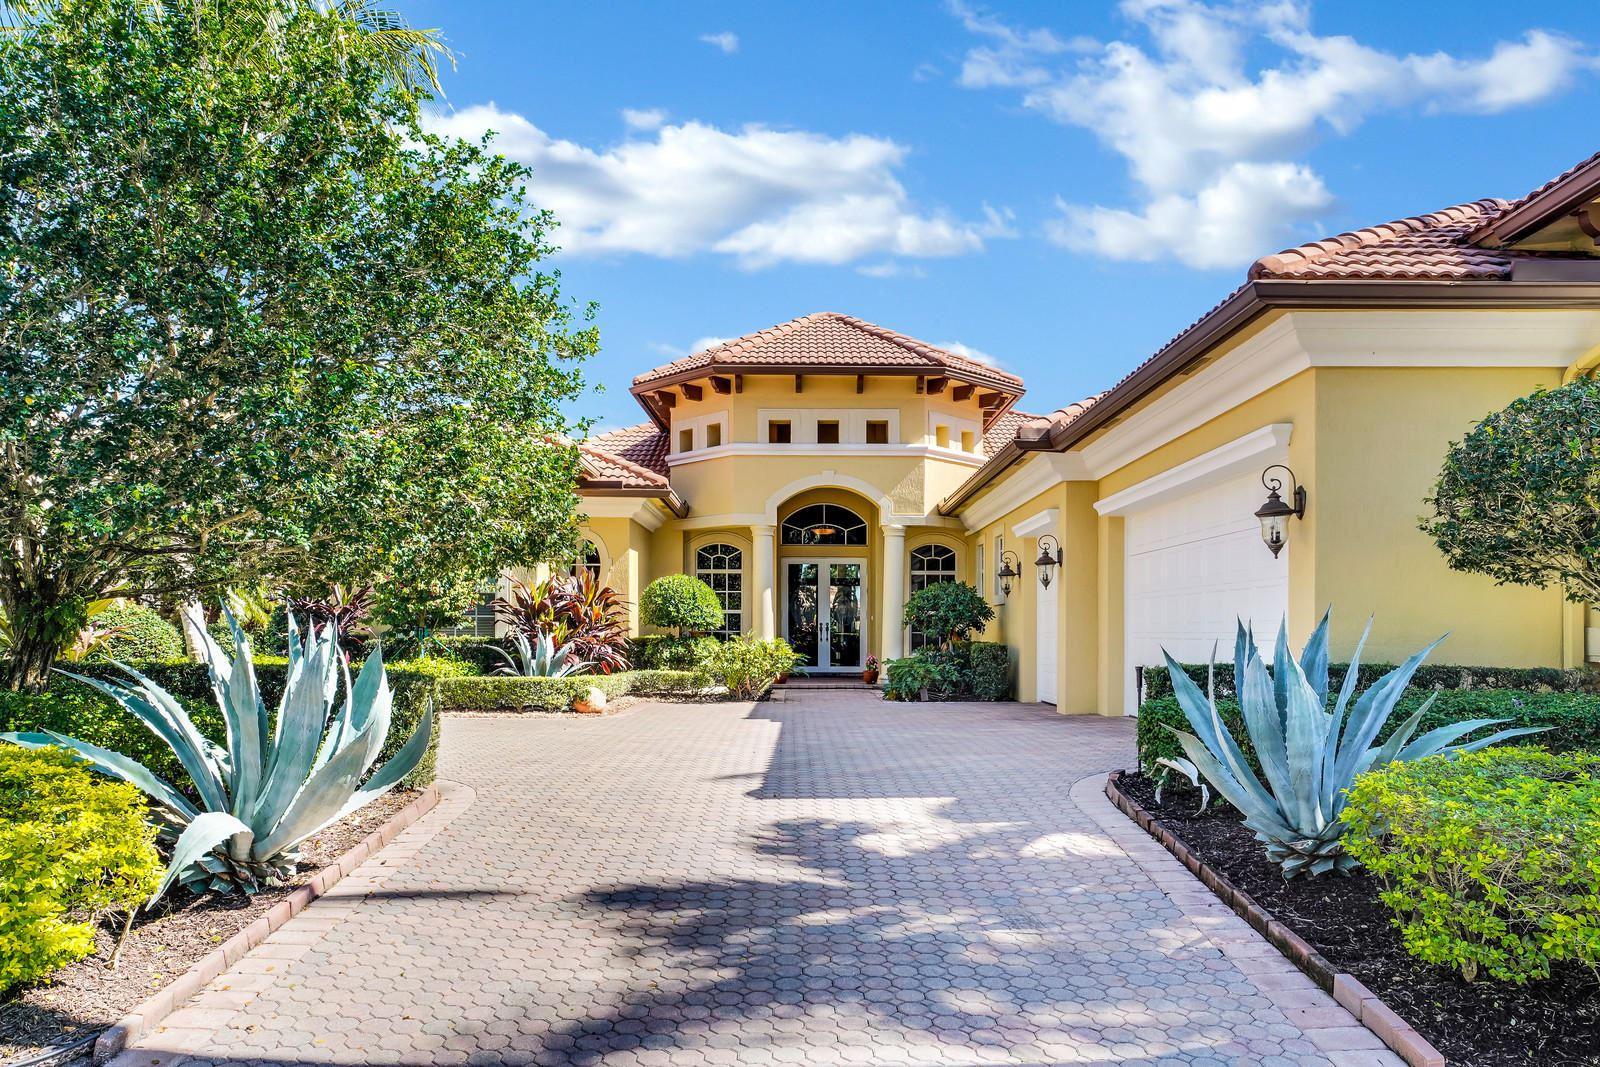 7928 Cranes Pointe Way, West Palm Beach, FL 33412 - #: RX-10607394